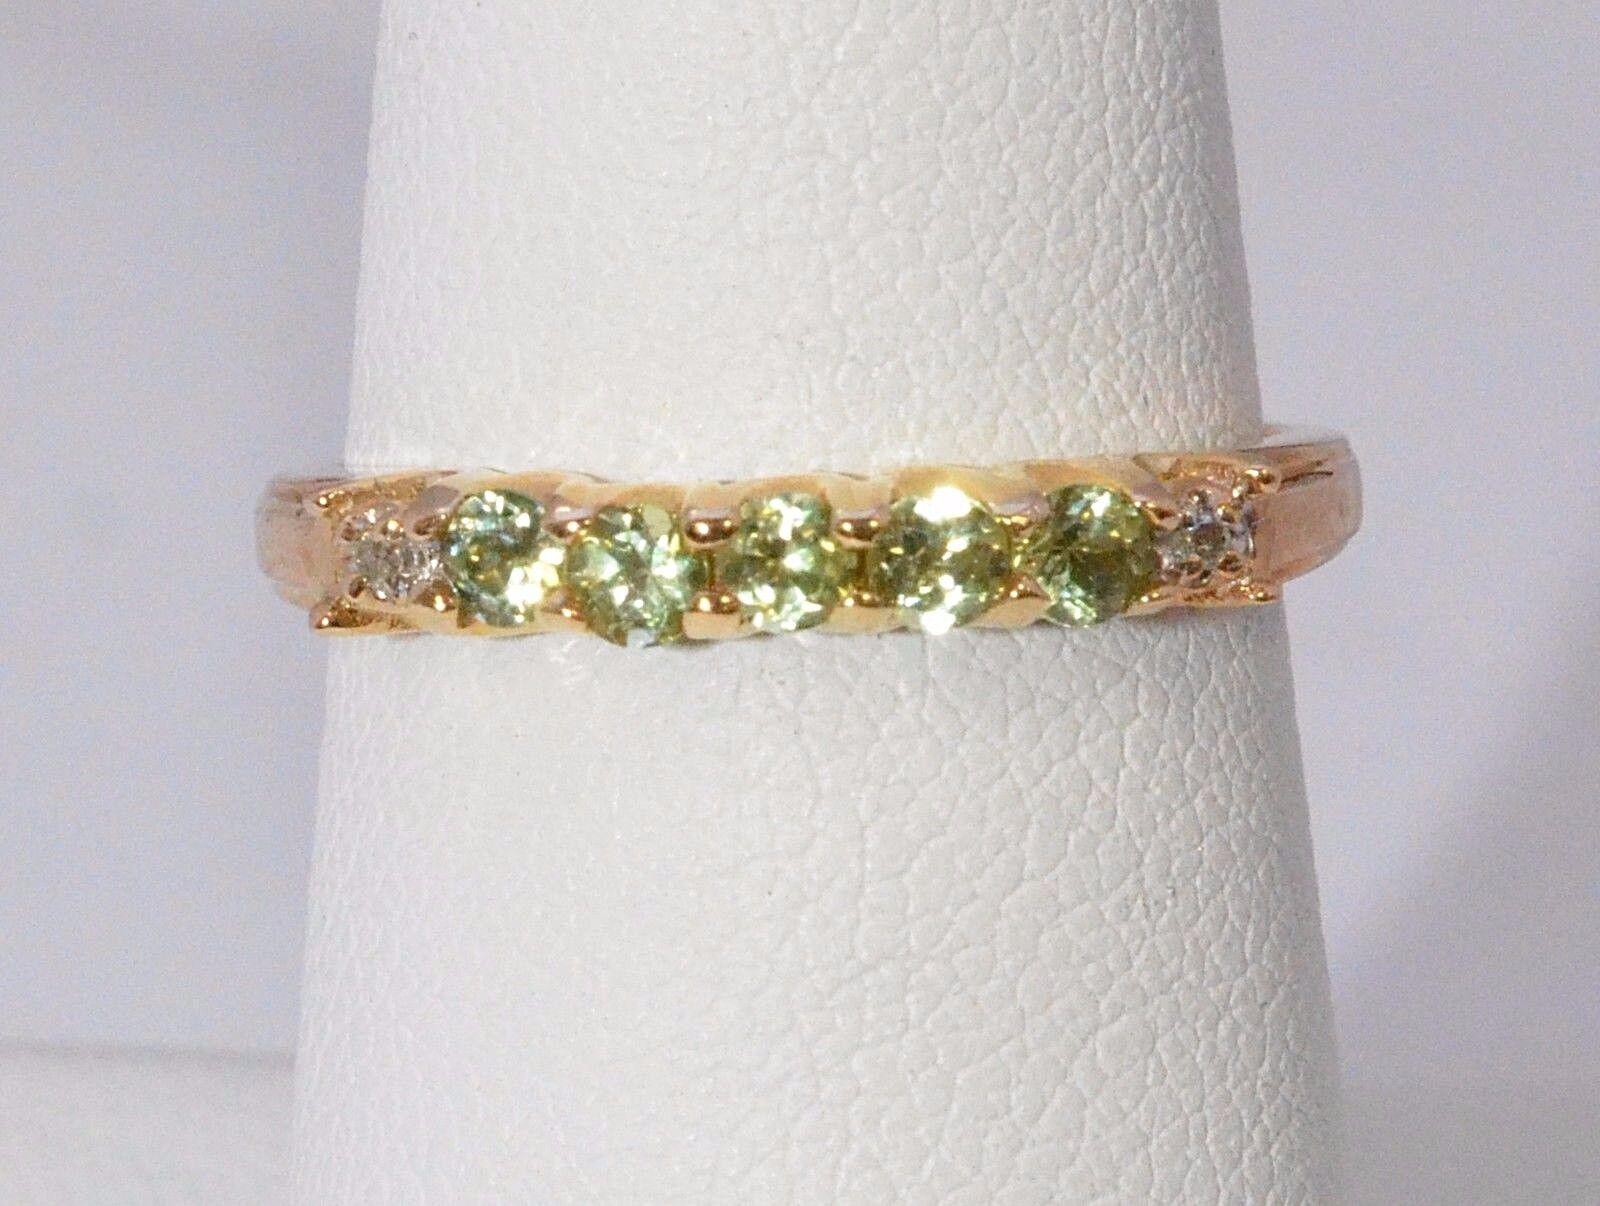 2574-10K YELLOW gold PERIDOT & DIAMOND 1.90 GRAMS SZ 7.0 RING